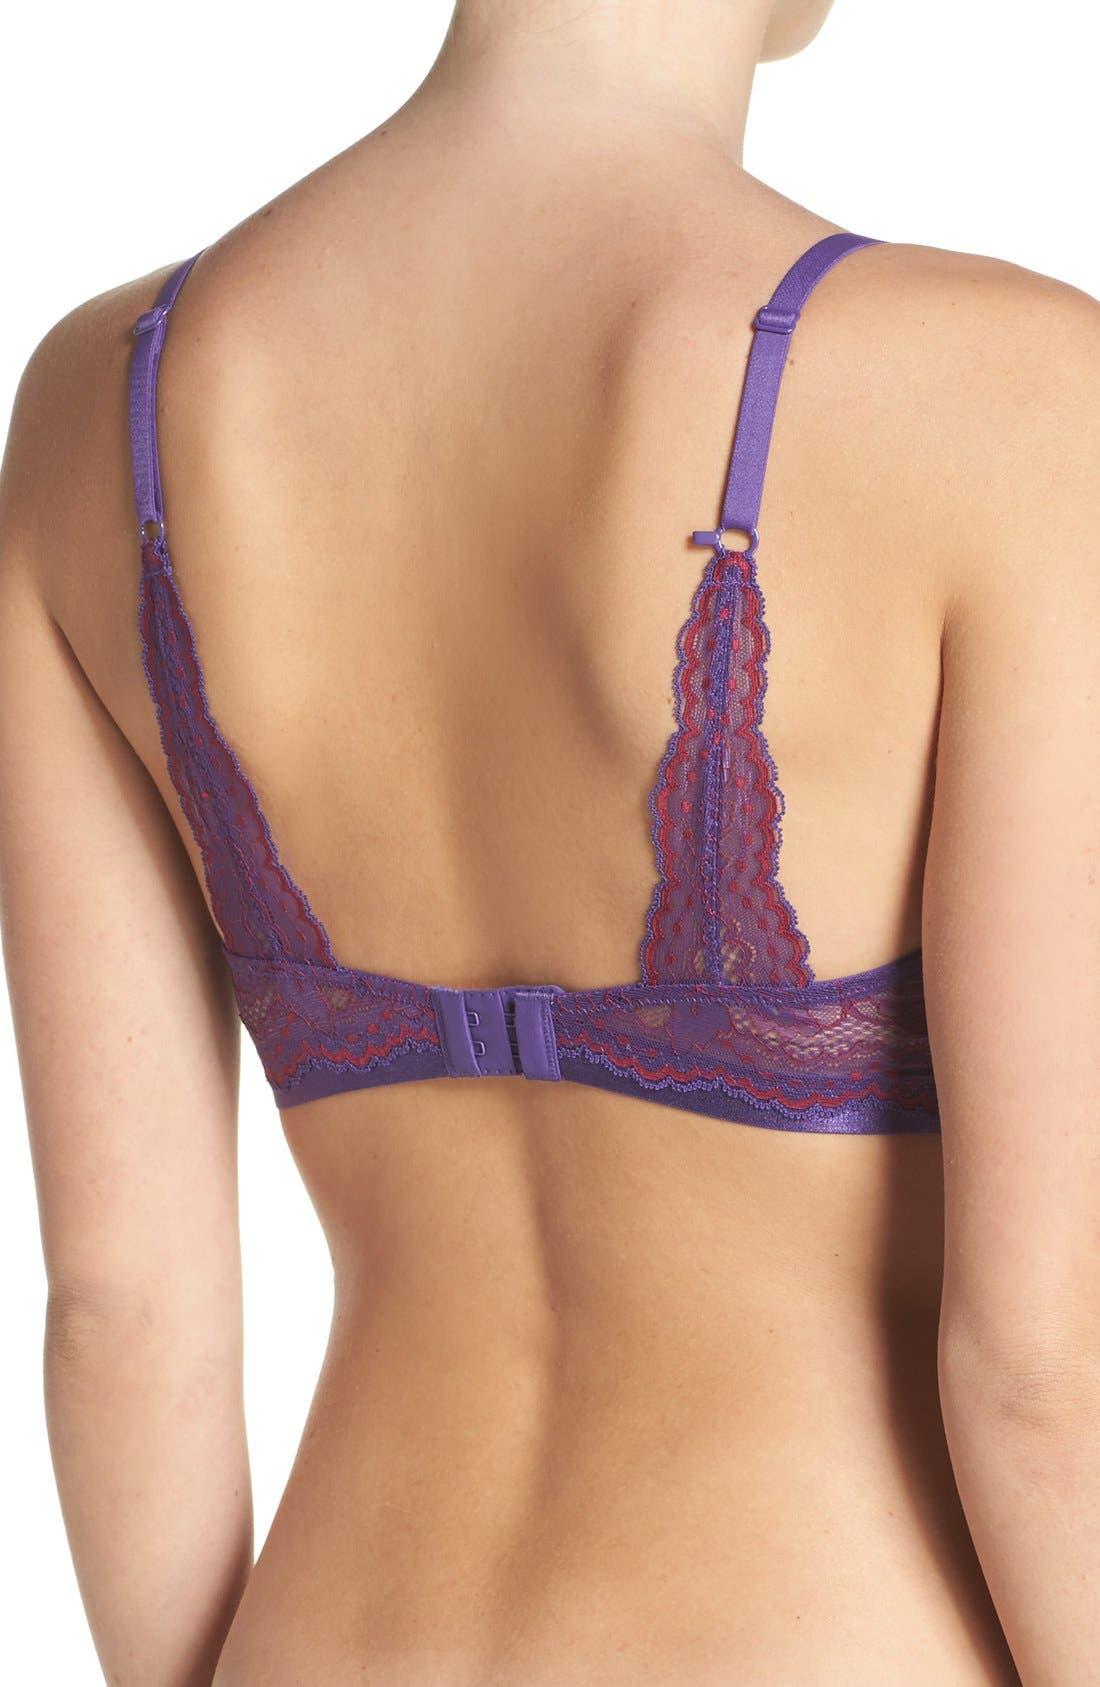 'Beautifully Basic' Lace Trim Underwire Plunge Bra,                             Alternate thumbnail 30, color,